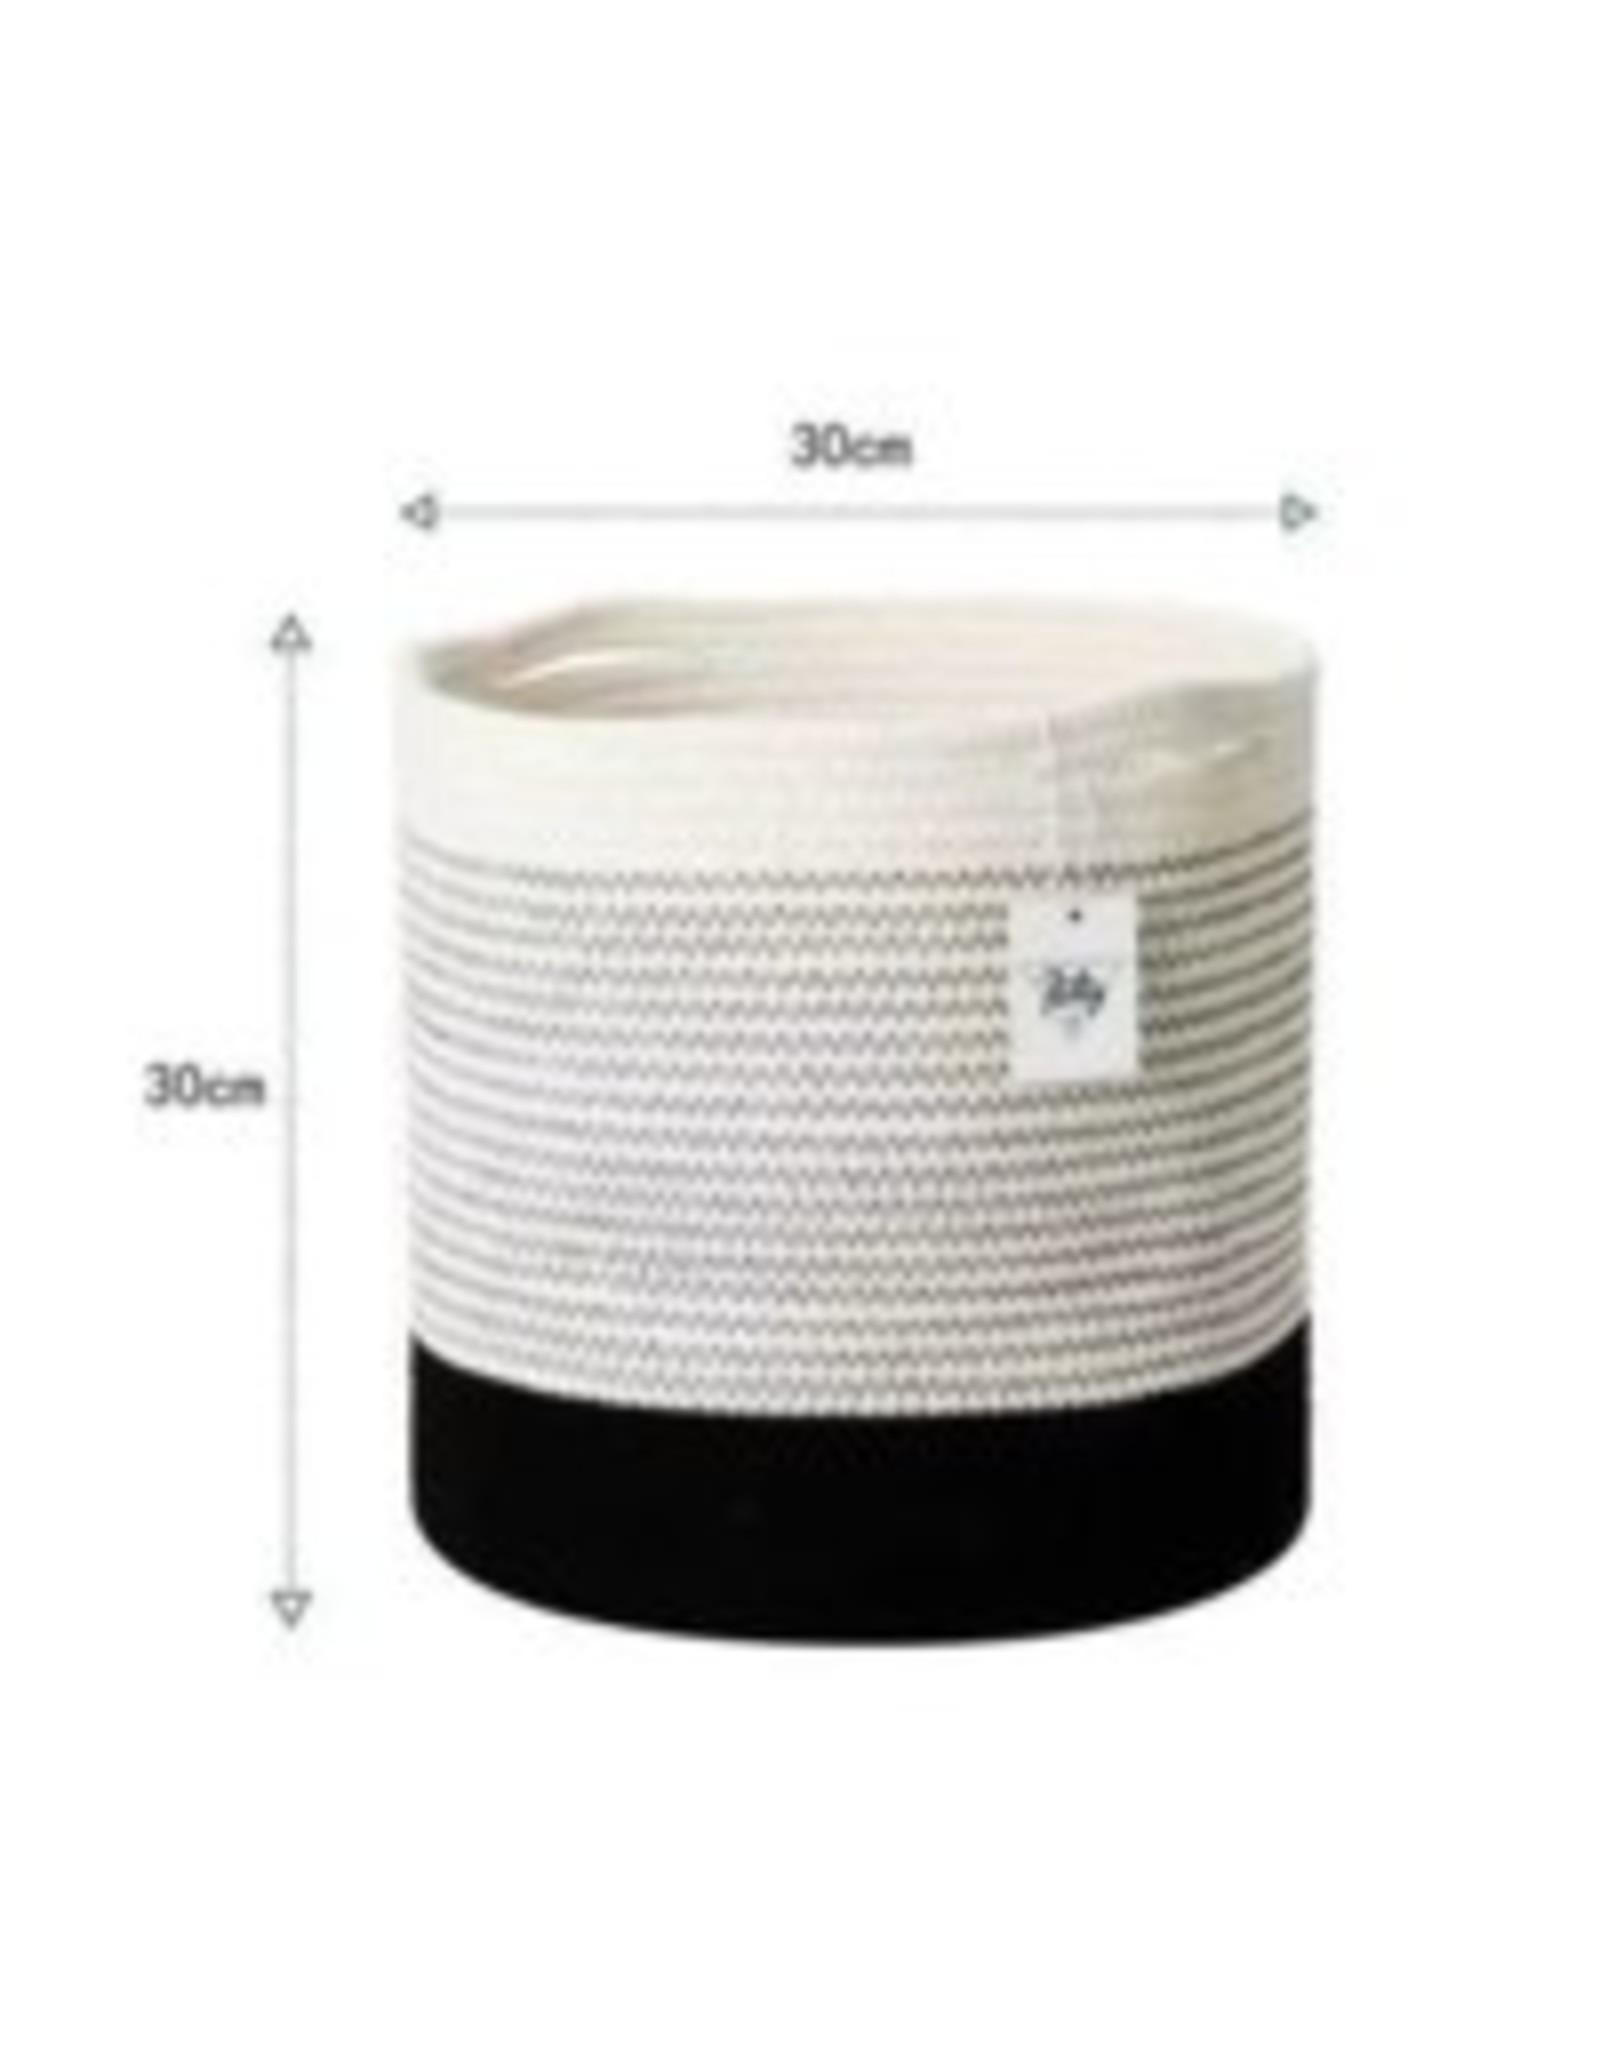 Basket CJ Cotton Rope White Black PHOMGR771200